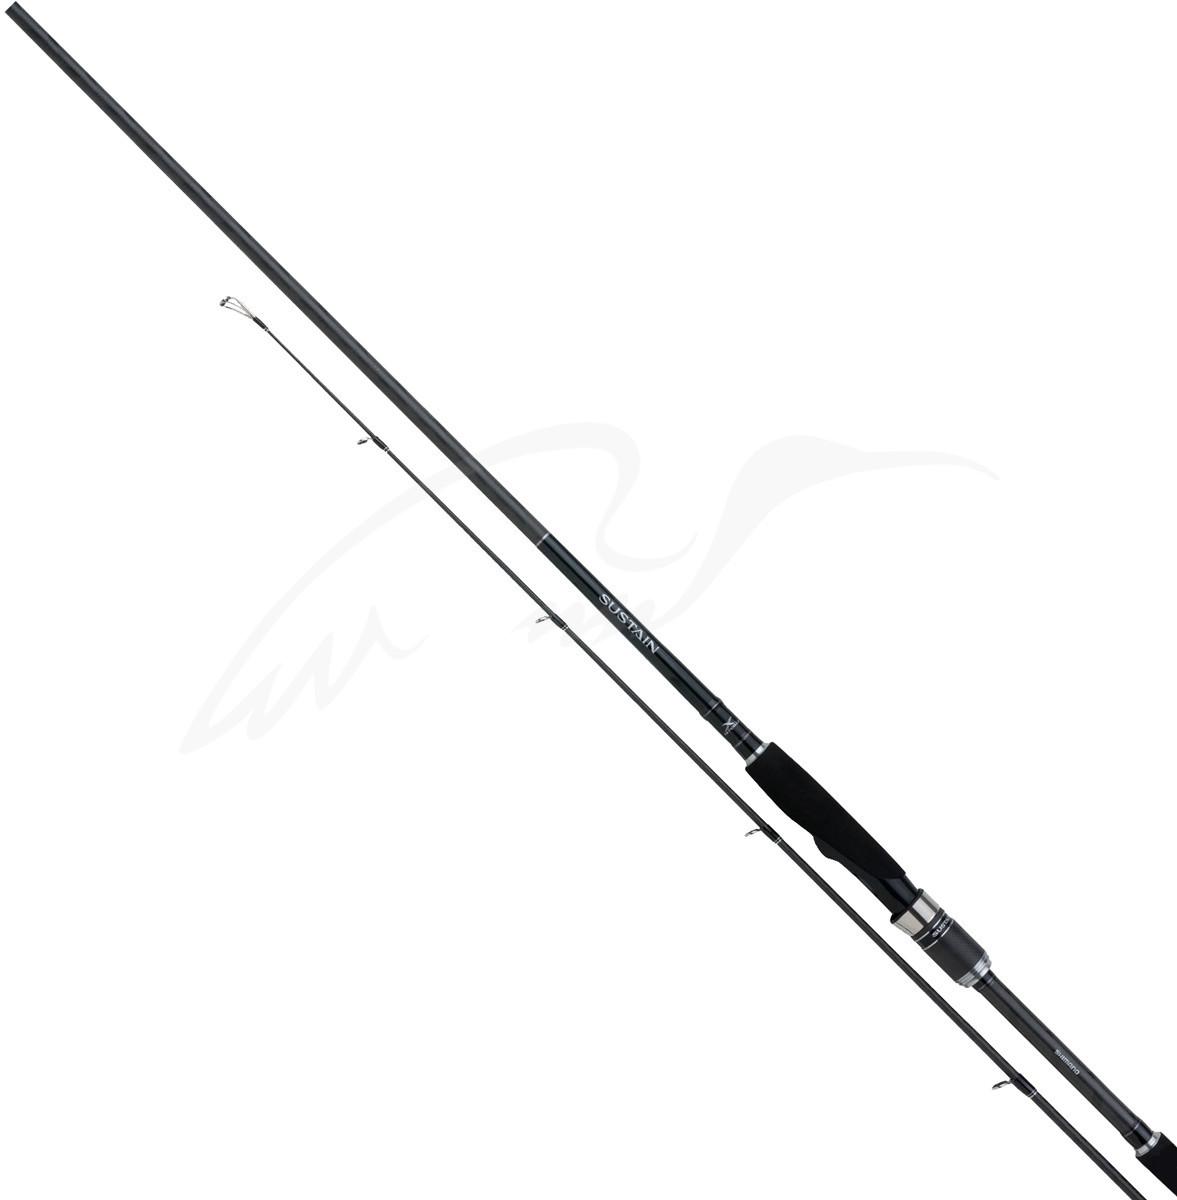 Спиннинг Shimano Sustain AX 710MH 2.44m 14-42g